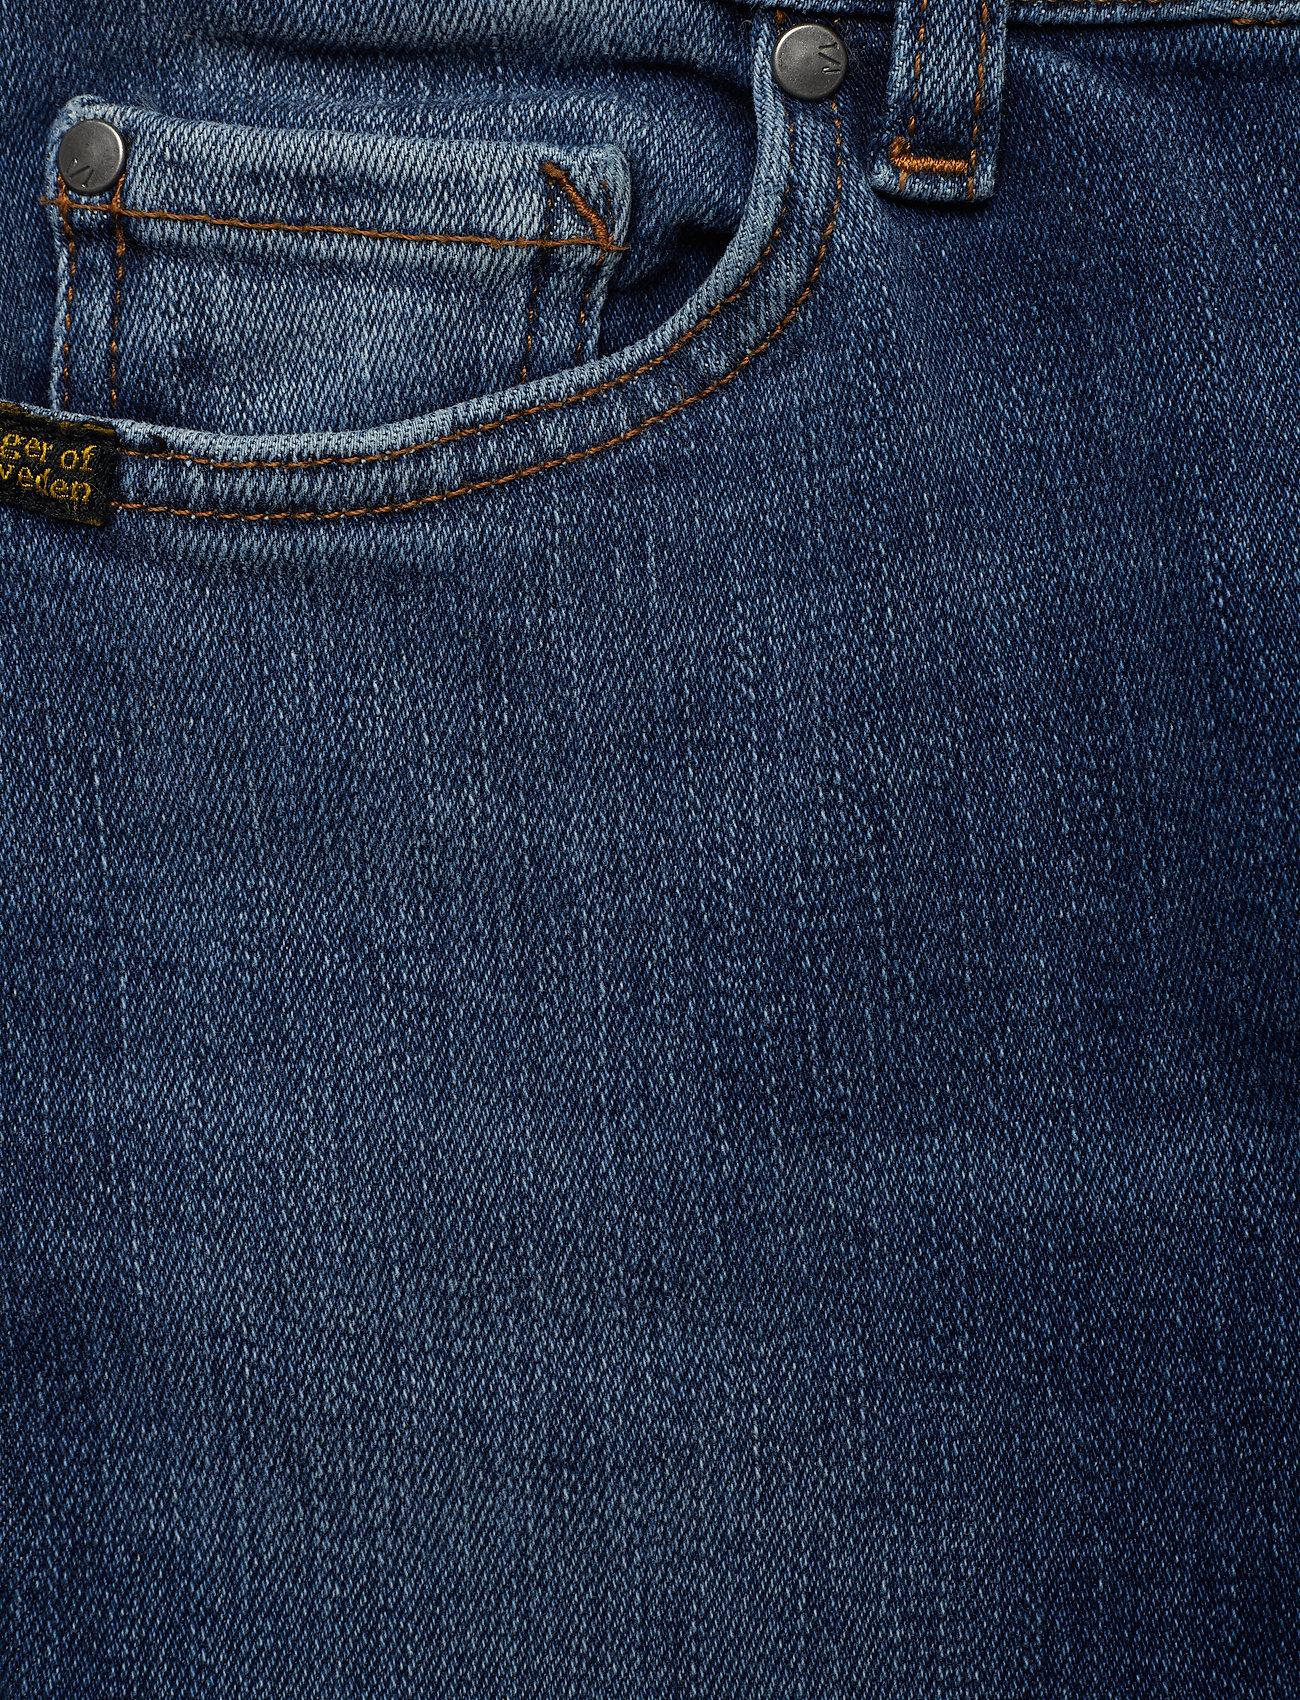 Sweden BlueTiger BlueTiger Loramedium Loramedium Of Jeans BlueTiger Loramedium Sweden Of Jeans SUzVMp